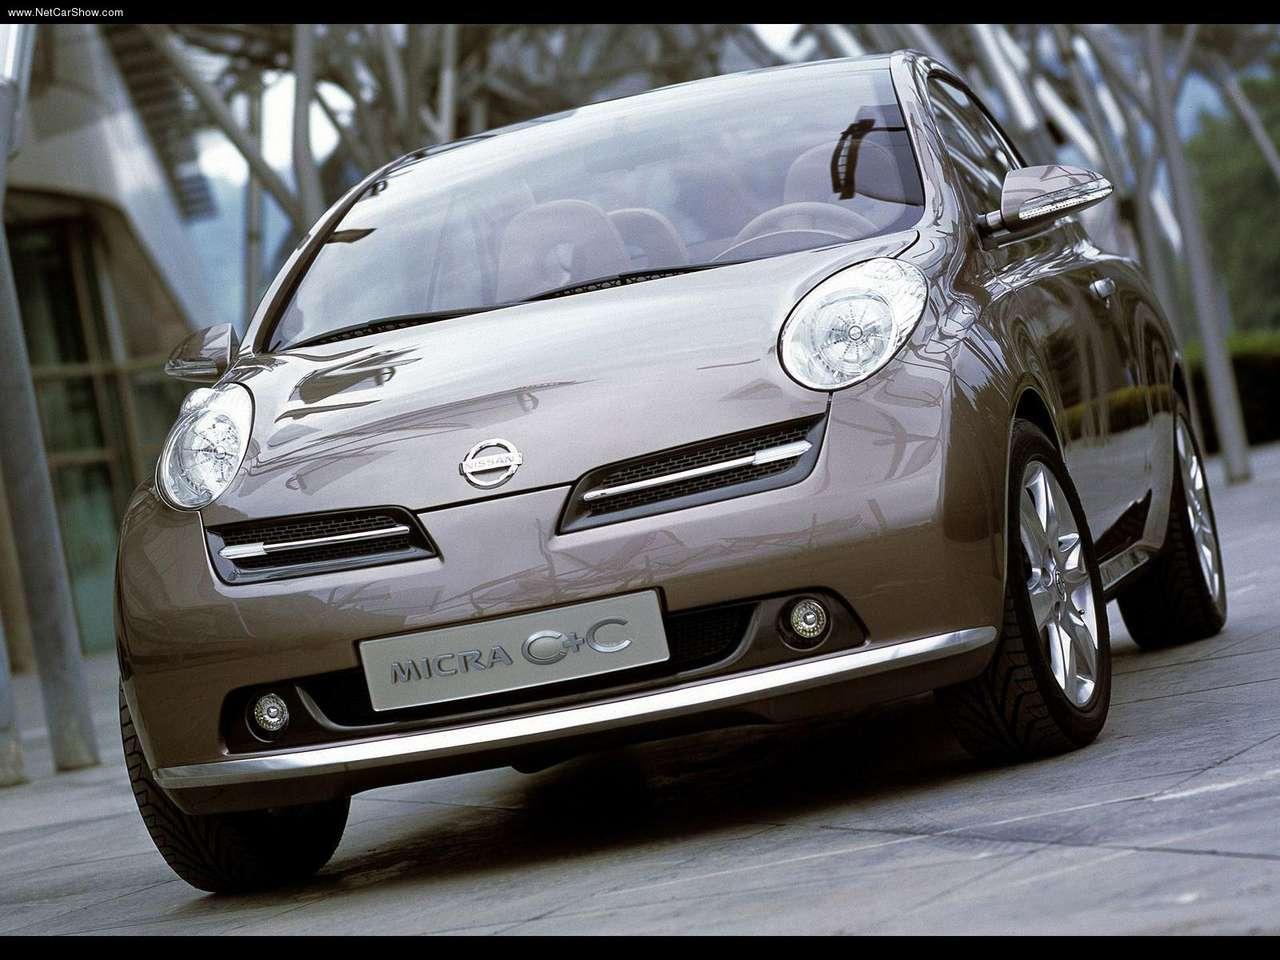 http://4.bp.blogspot.com/--cVzN5ebfkc/TYDEbYgkoFI/AAAAAAAAGIc/fjWq0L8sr54/s1600/Nissan-Micra_C%252BC_Concept_2002_1280x960_wallpaper_04.jpg